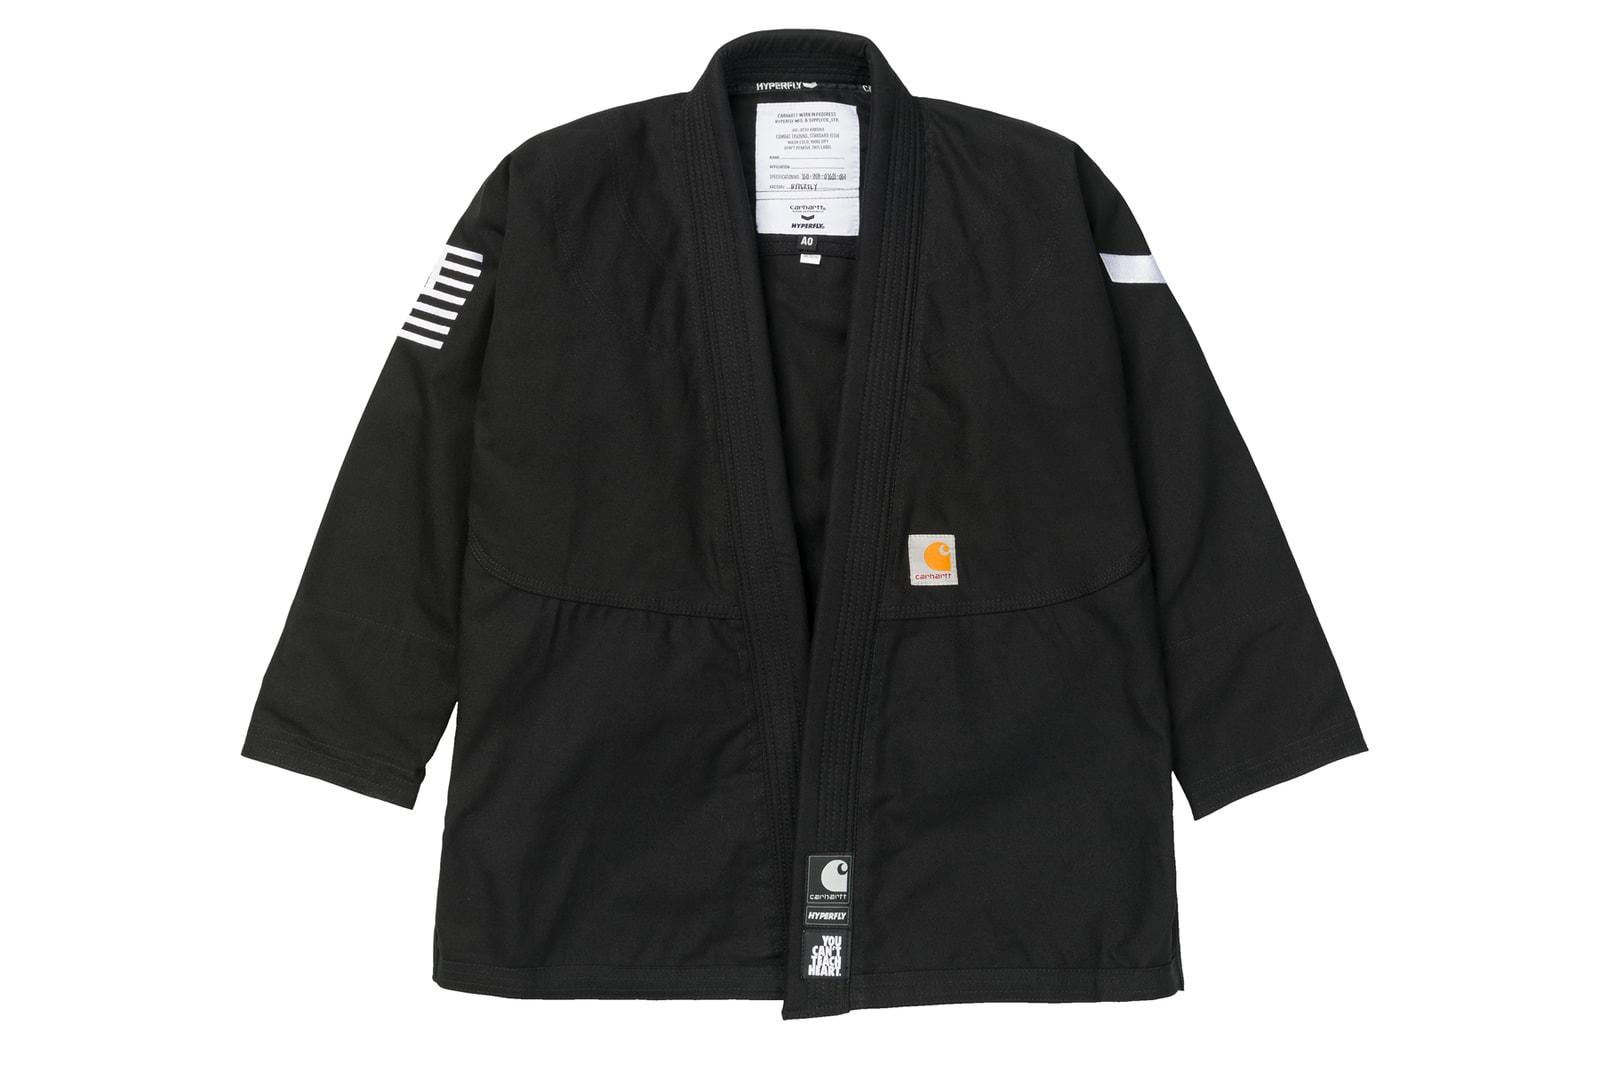 Carhartt WIP Hyperfly kimono gi jiu jitsu set uniform shirt pants tote bag branding squad collaboration clothing drop release date info martial arts black white navy blue hamilton brown tan beige